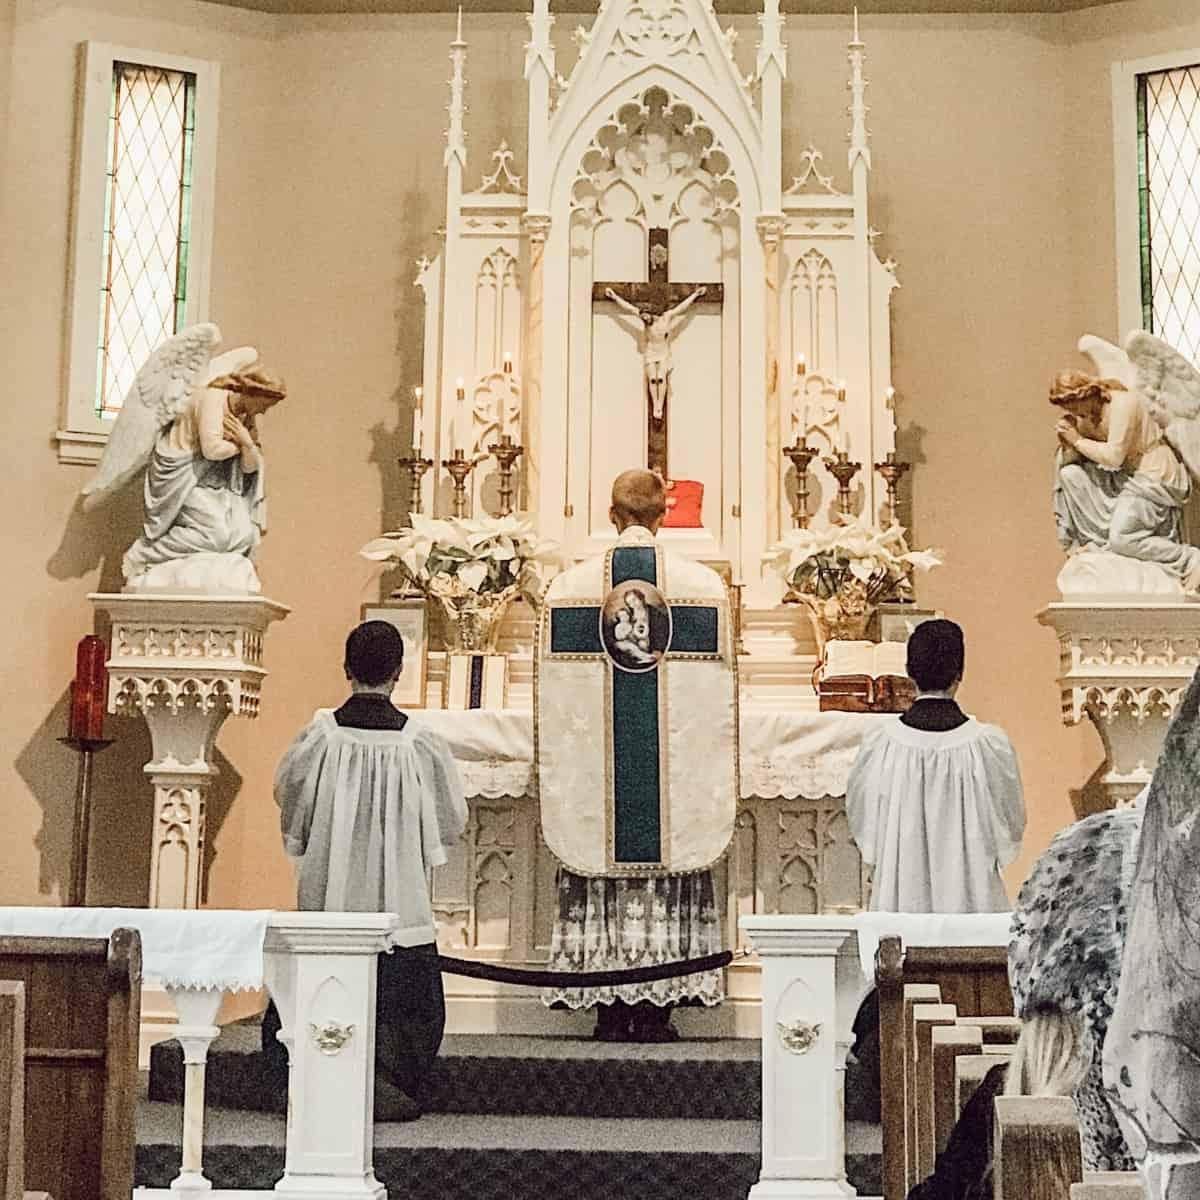 Sanctifying Sundays with Preparation